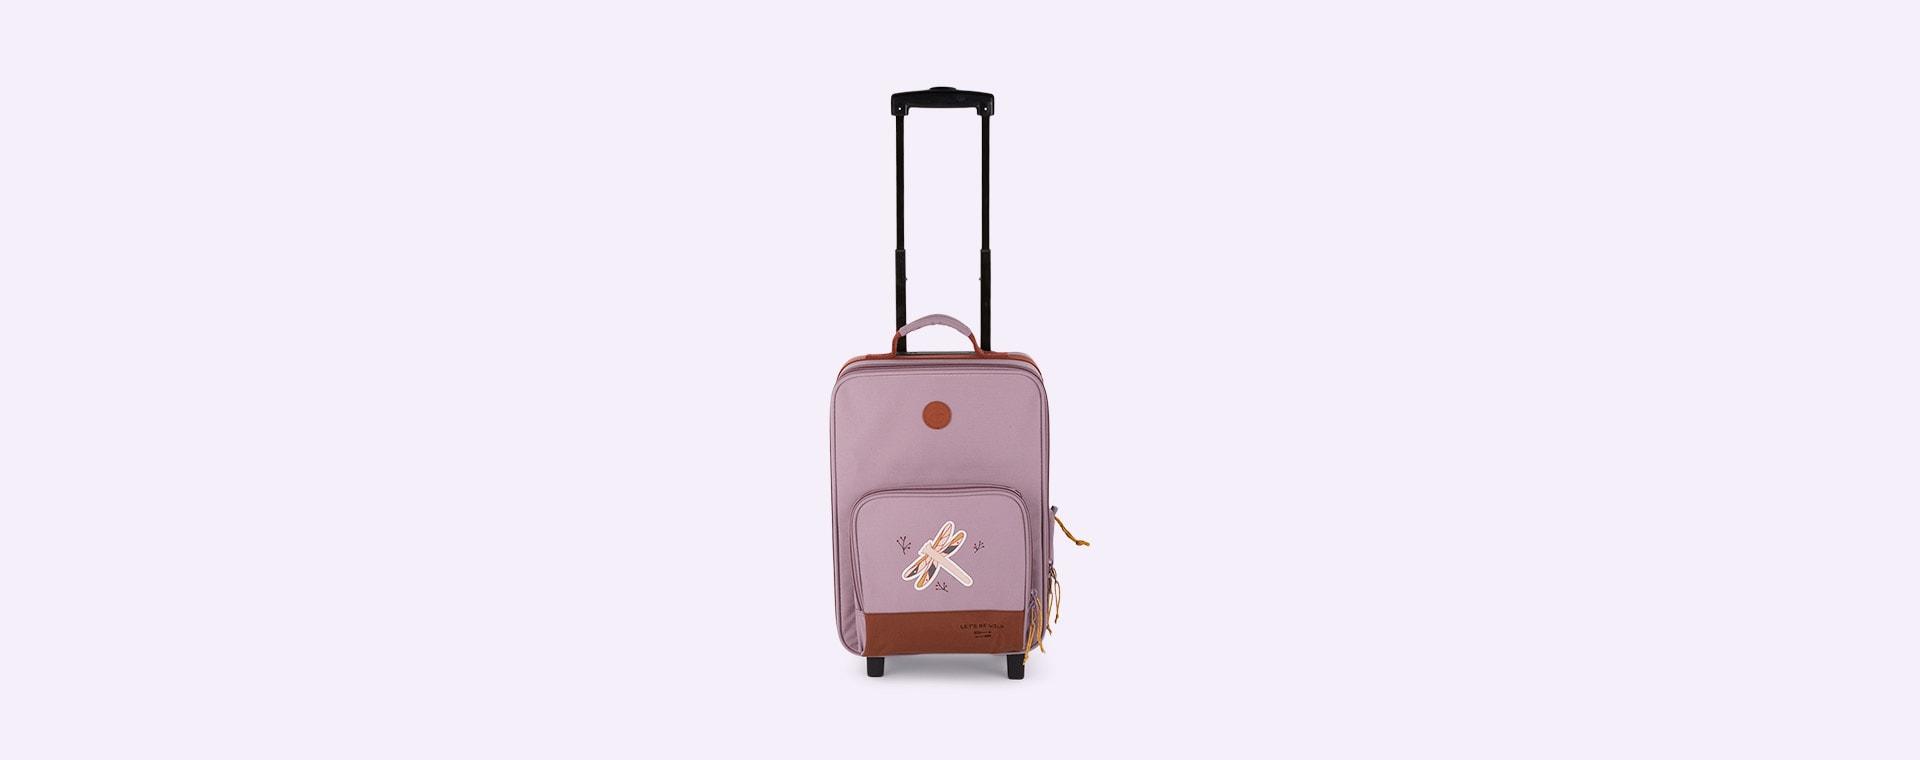 Adventure Dragonfly Lassig Trolley Suitcase